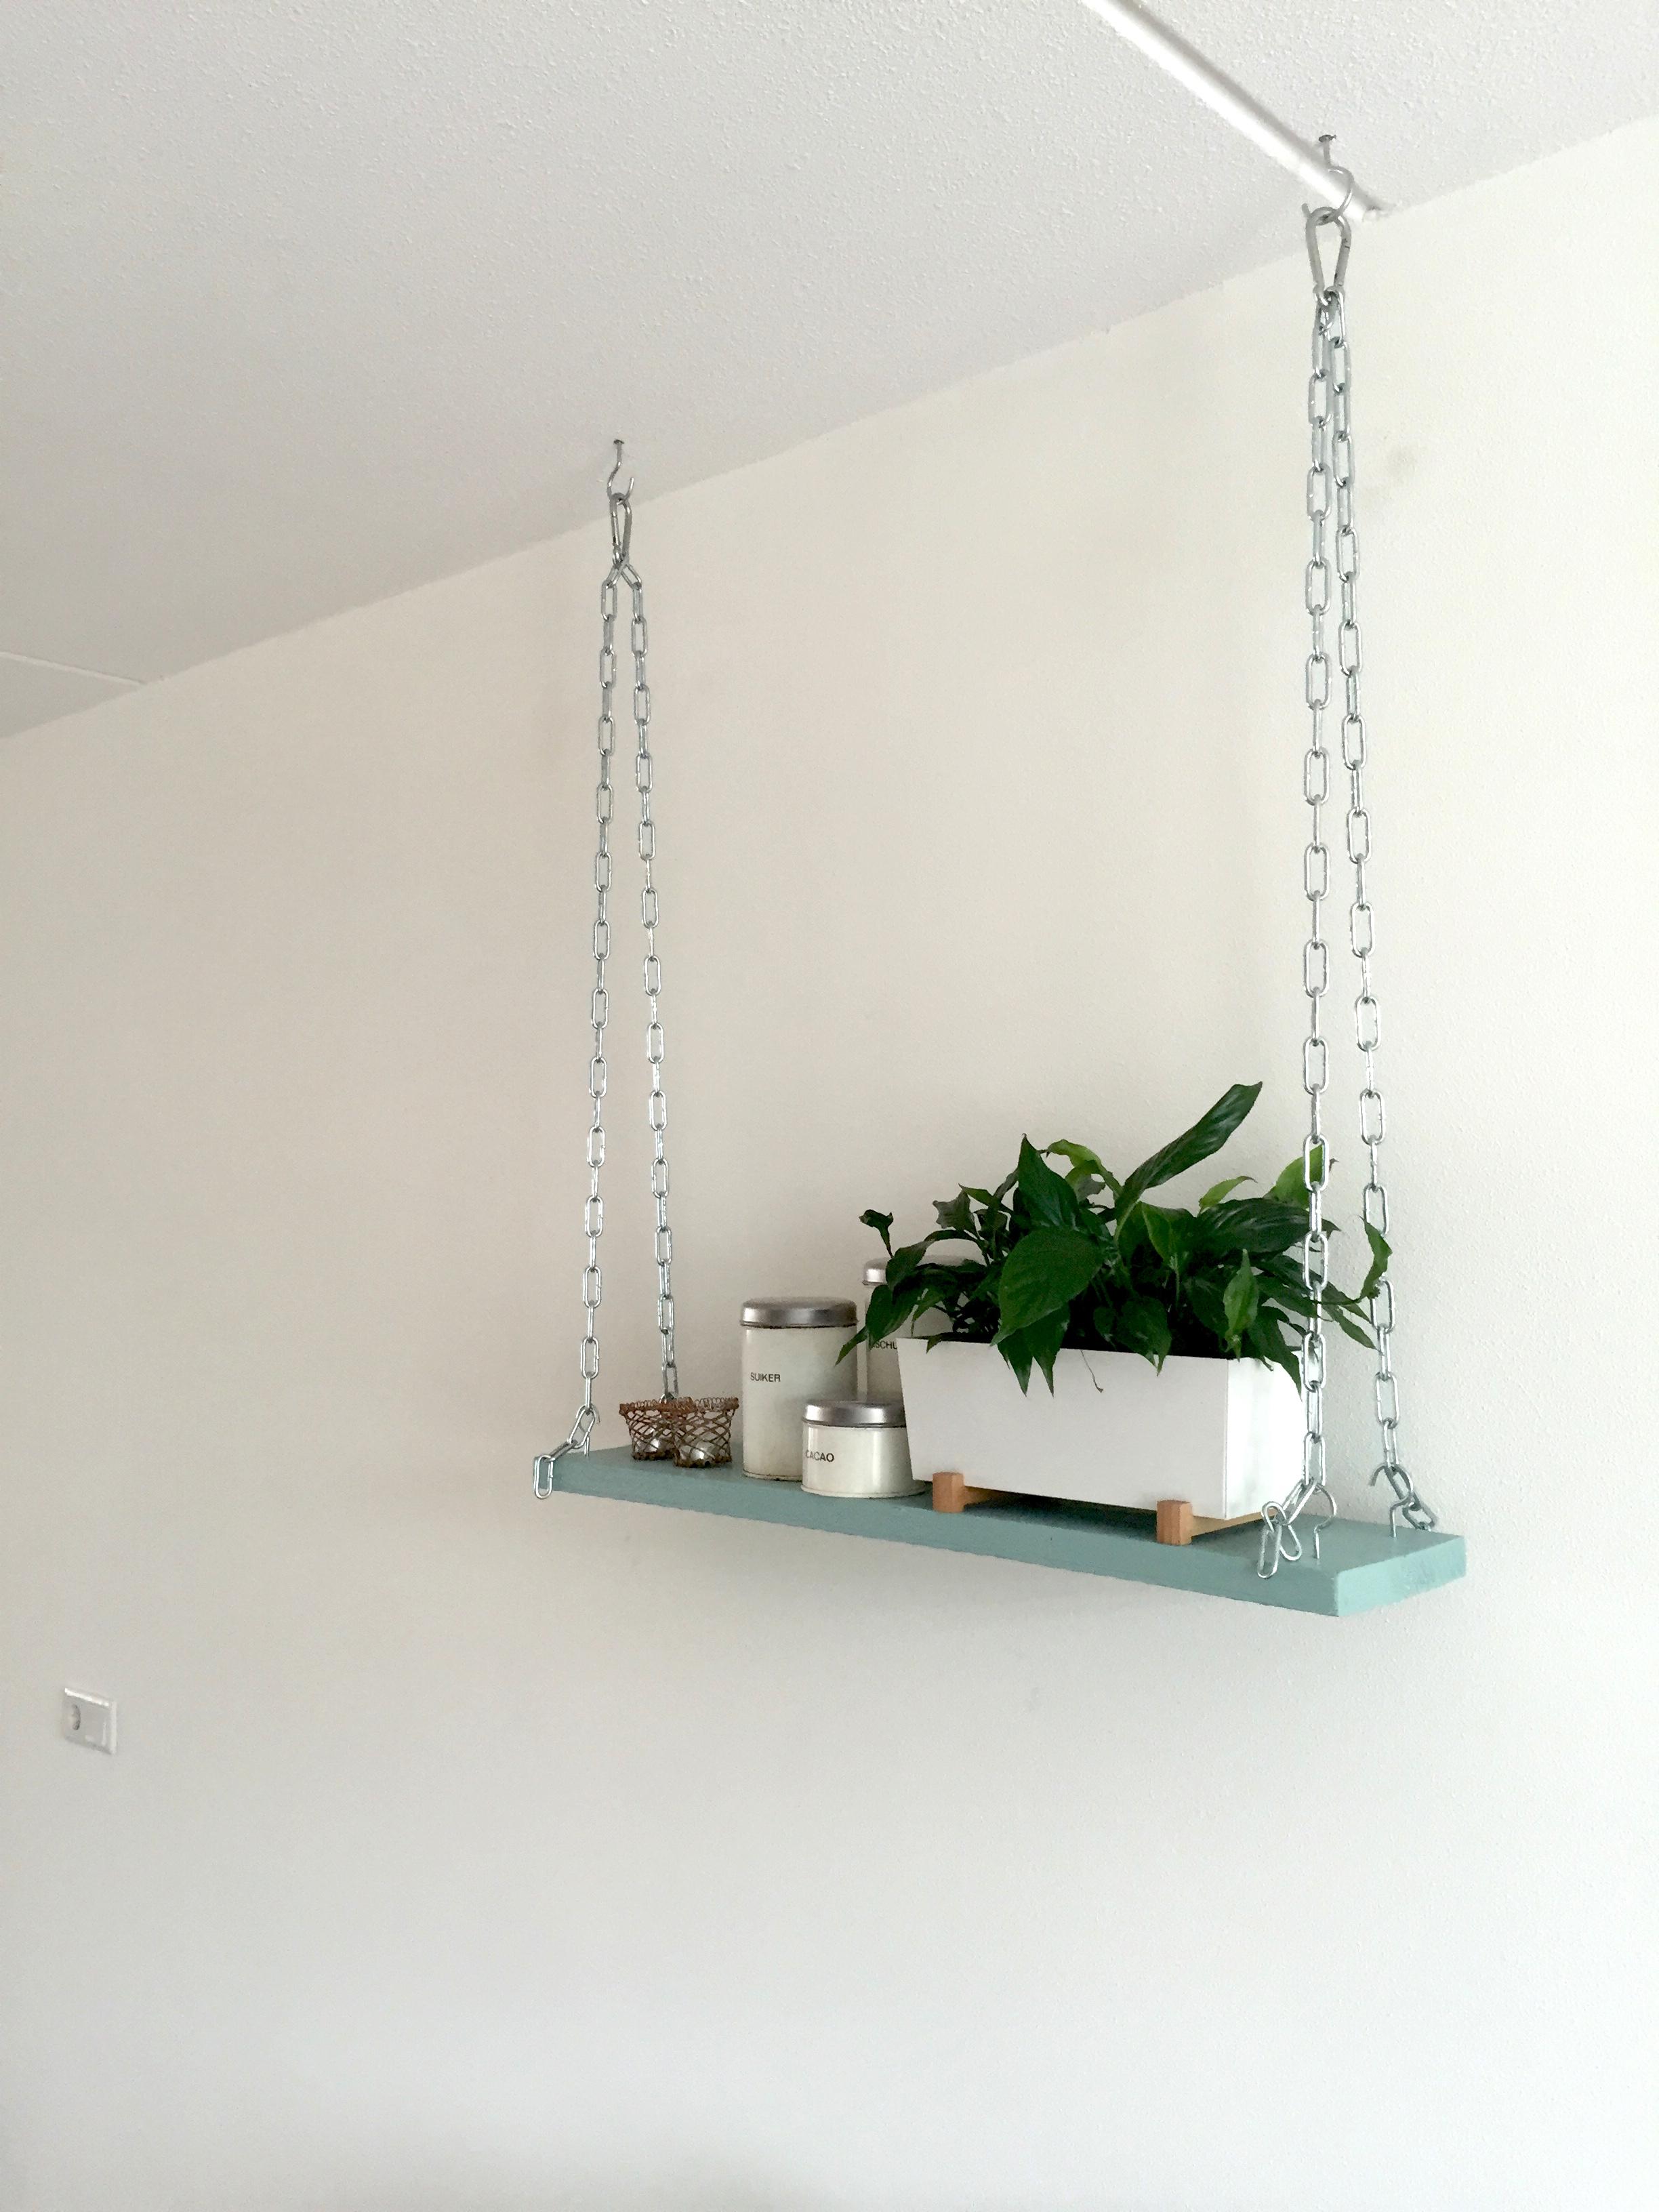 Plank Bevestigen Muur.Hangende Industriele Plank Aan Het Plafond Interieur By Cher